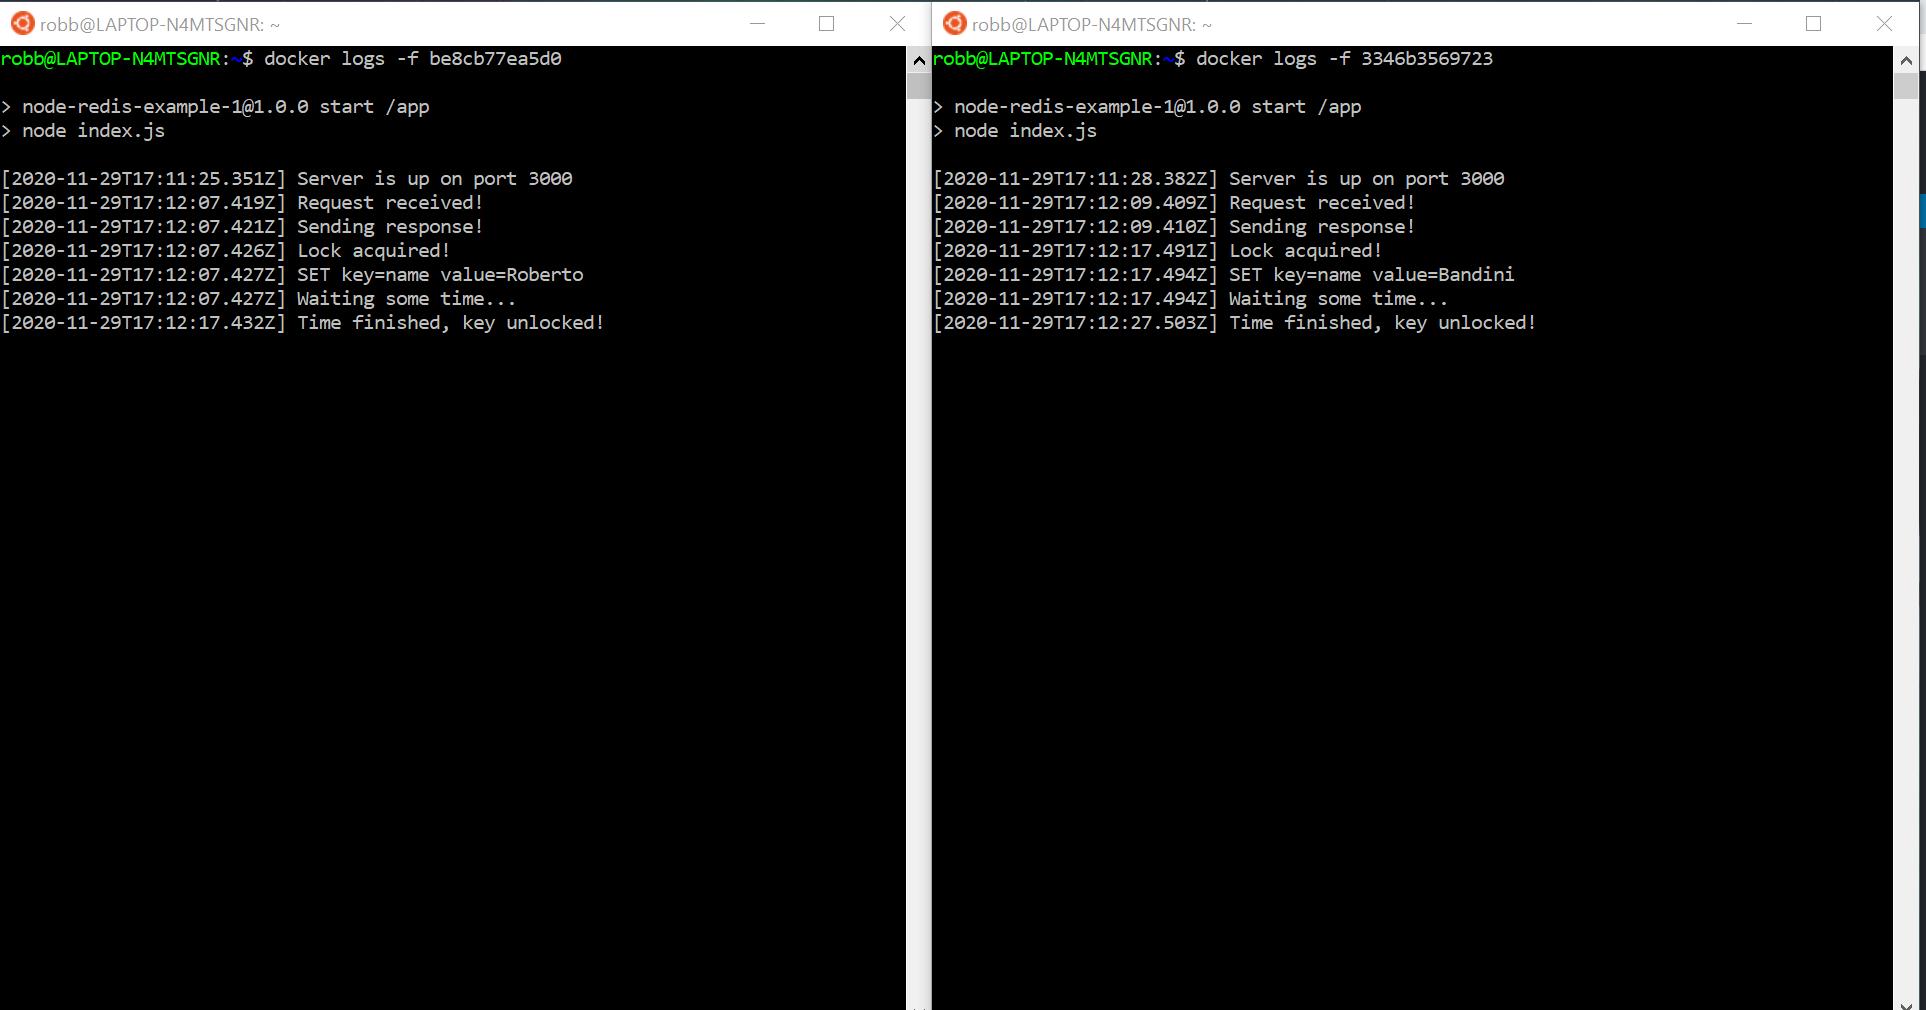 Node.js Redlock tests logs